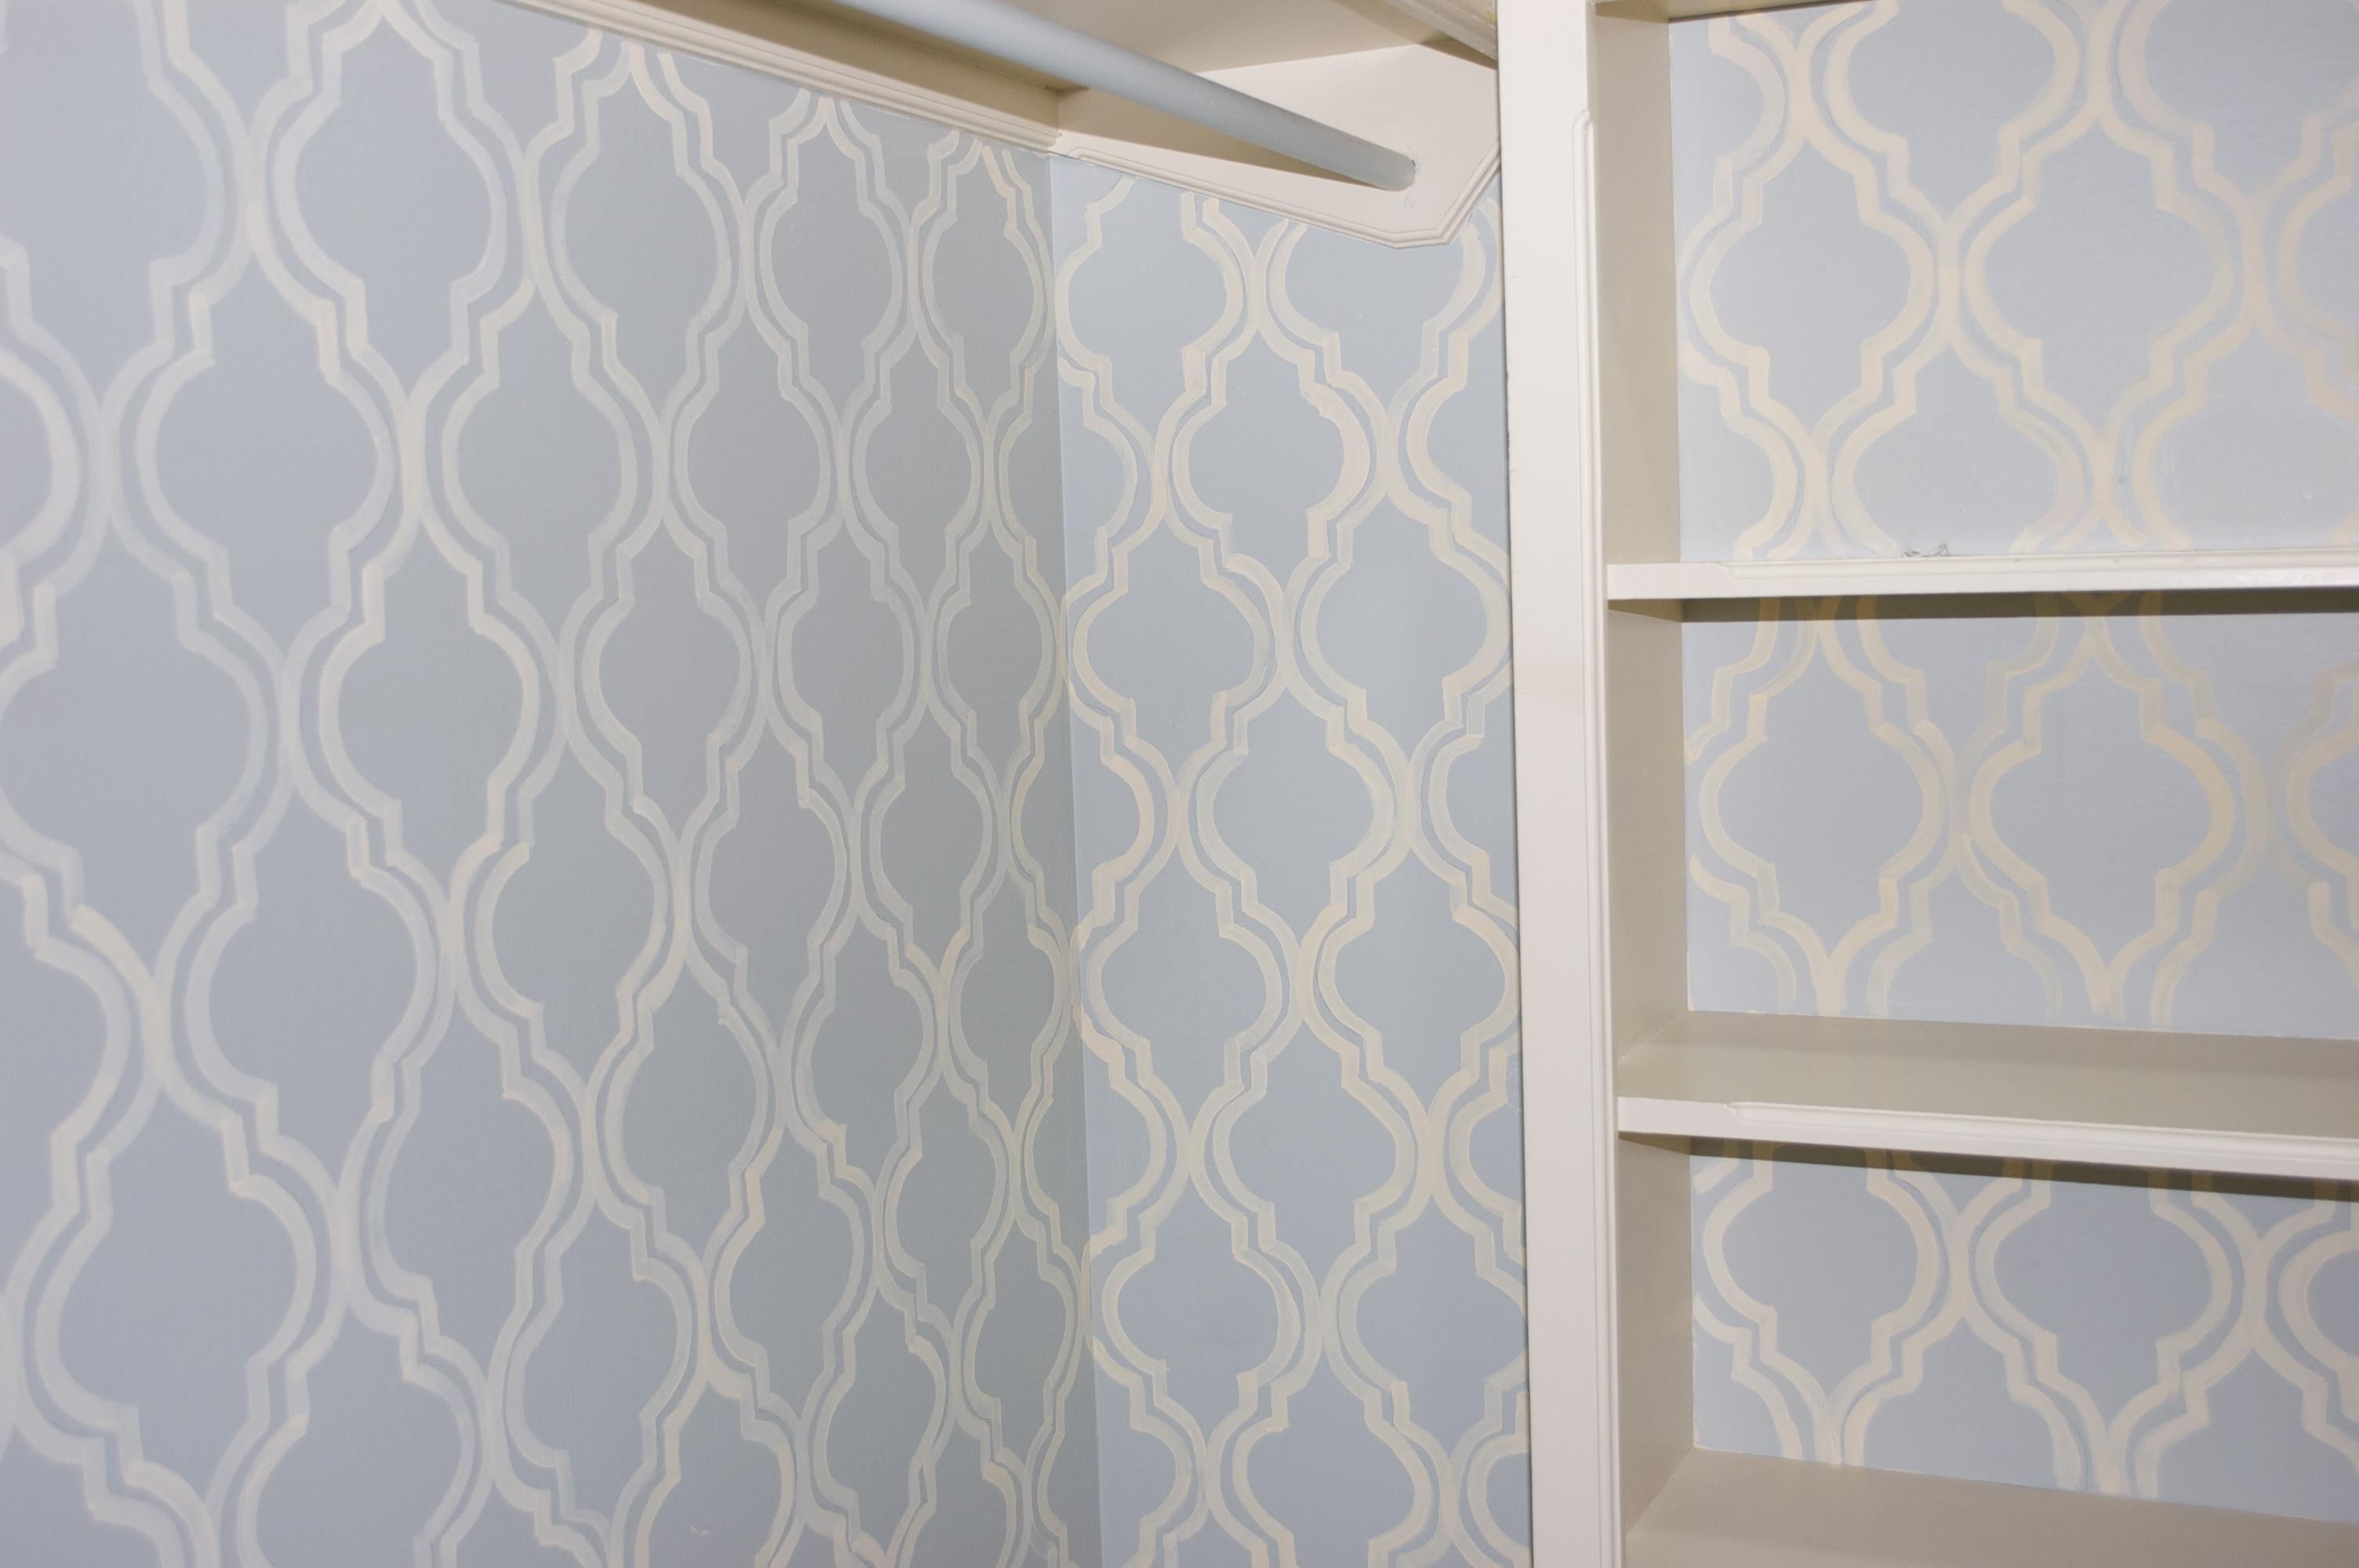 BROWSE sherwin williams wallpaper easy change  HD Photo Wallpaper 3008x2000